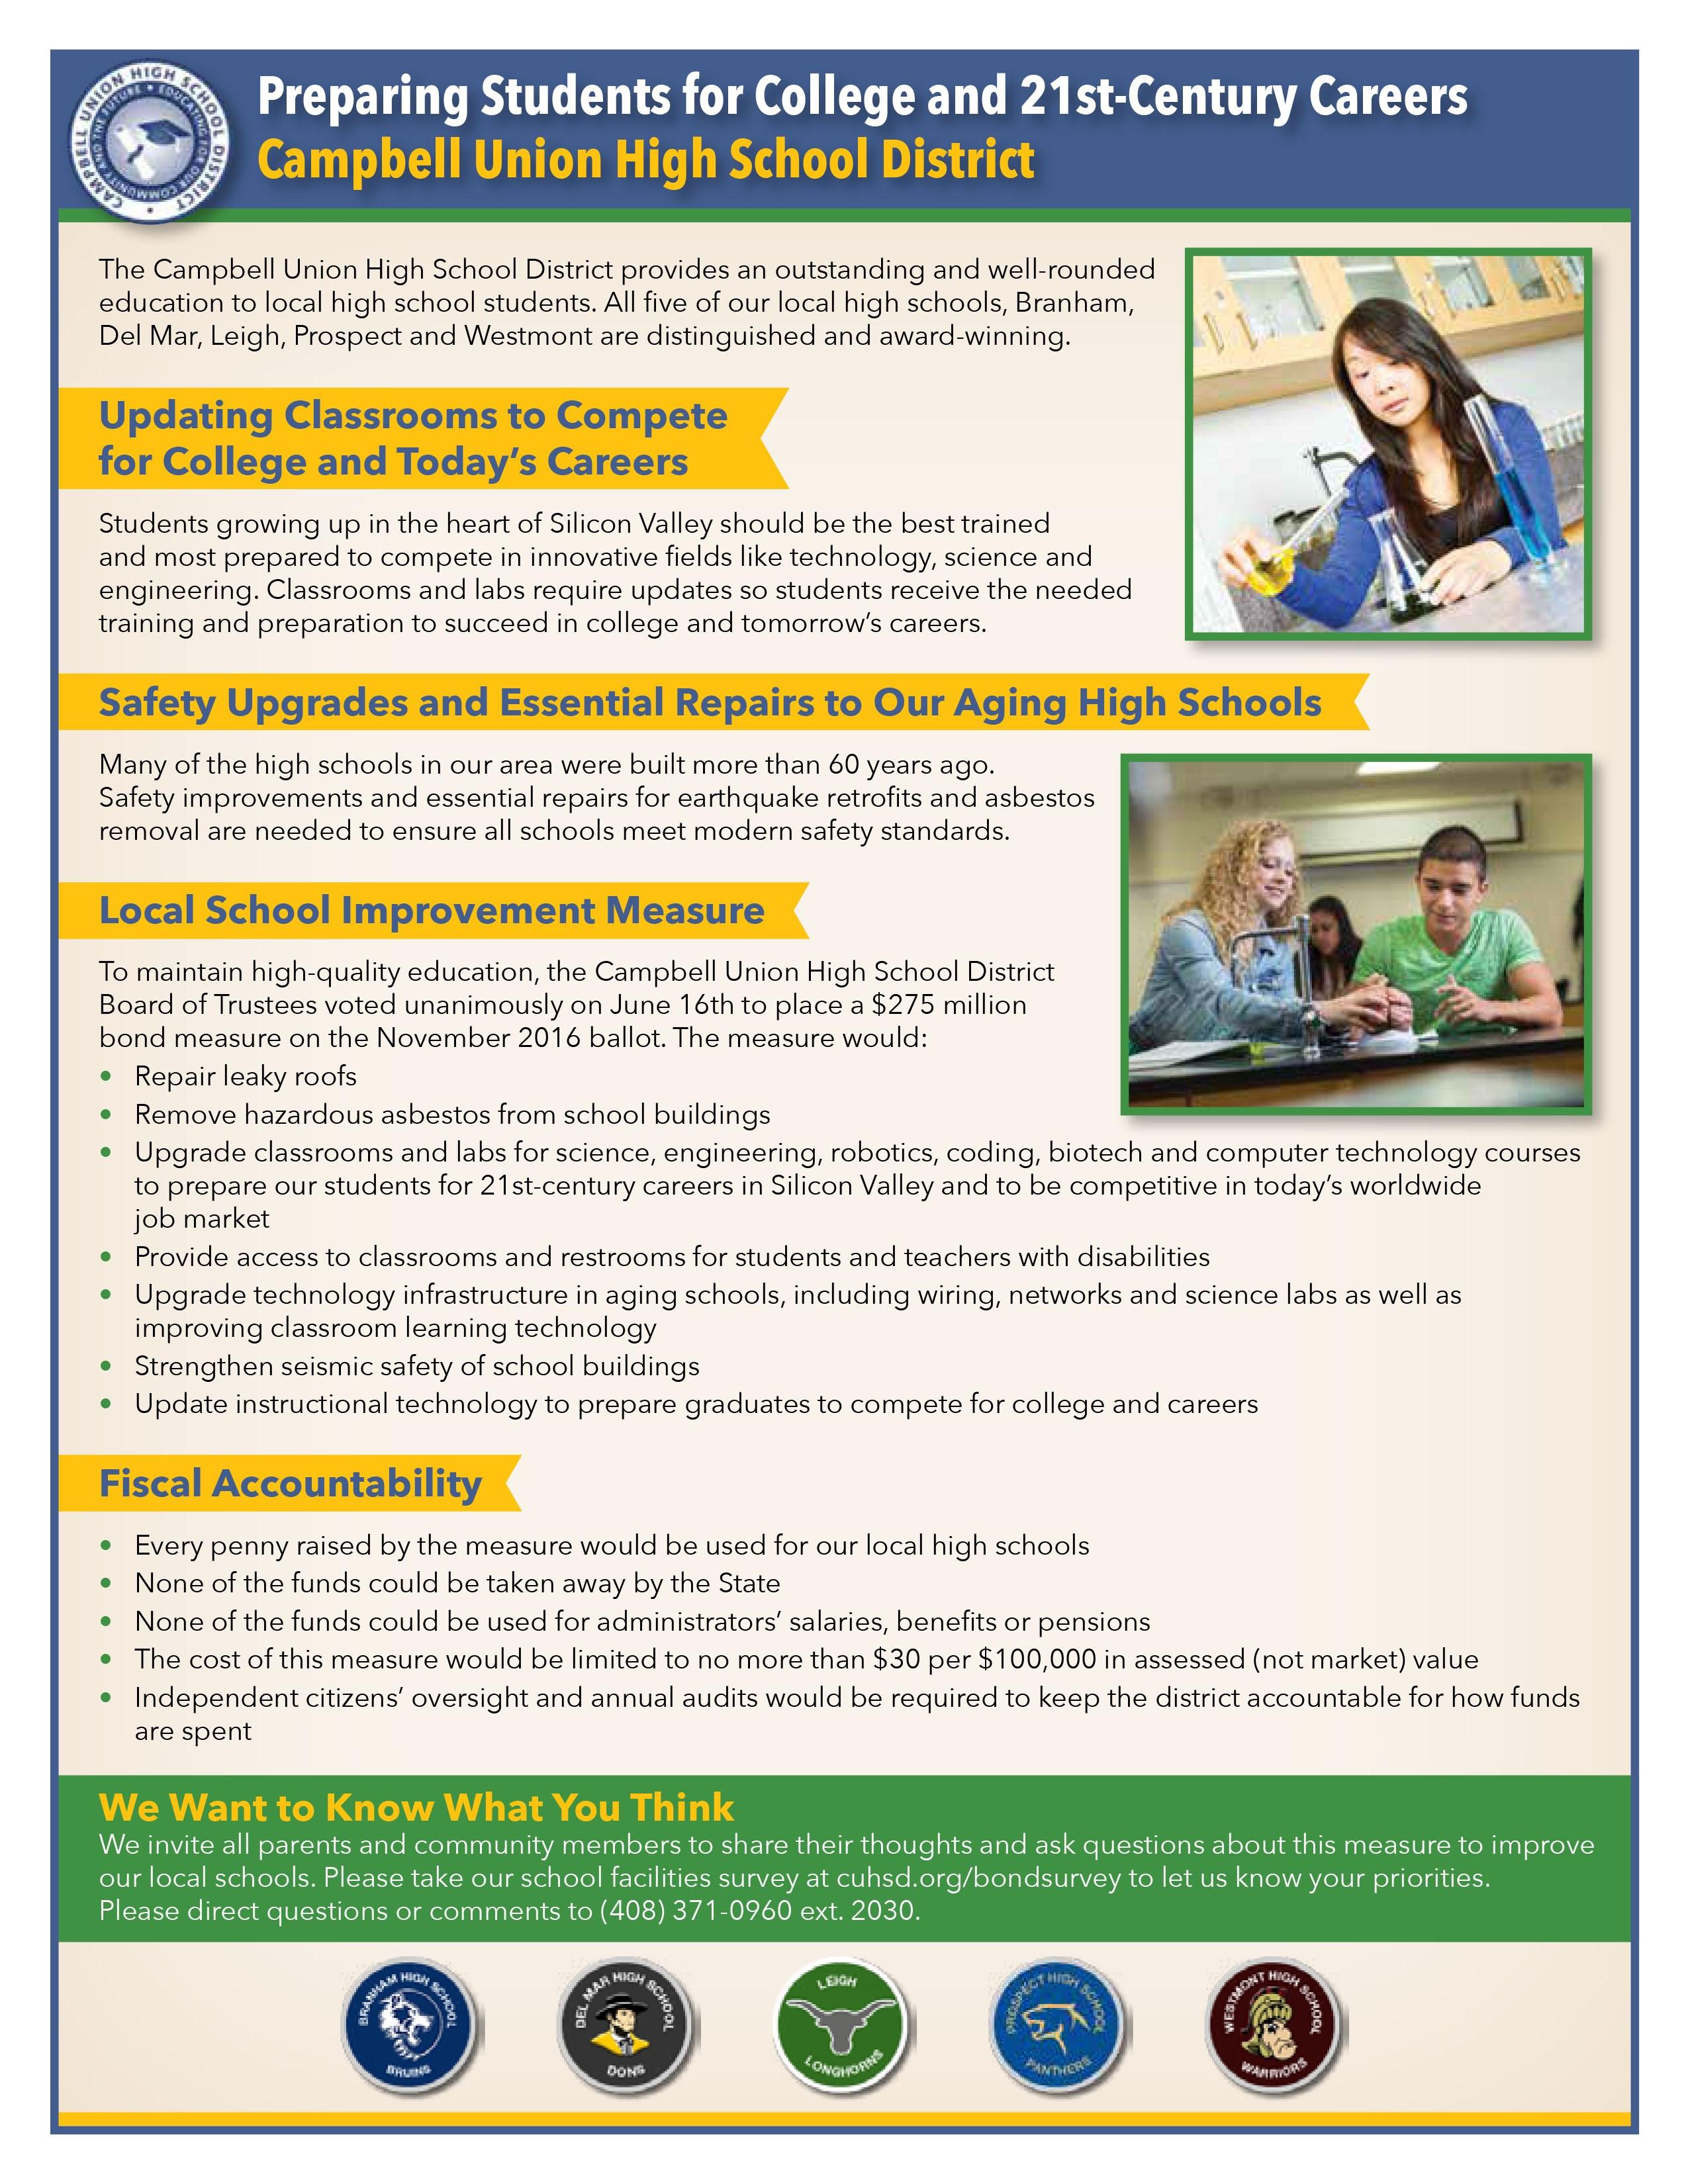 bond measure district departments campbell union high 2016 bond measure district departments campbell union high school district